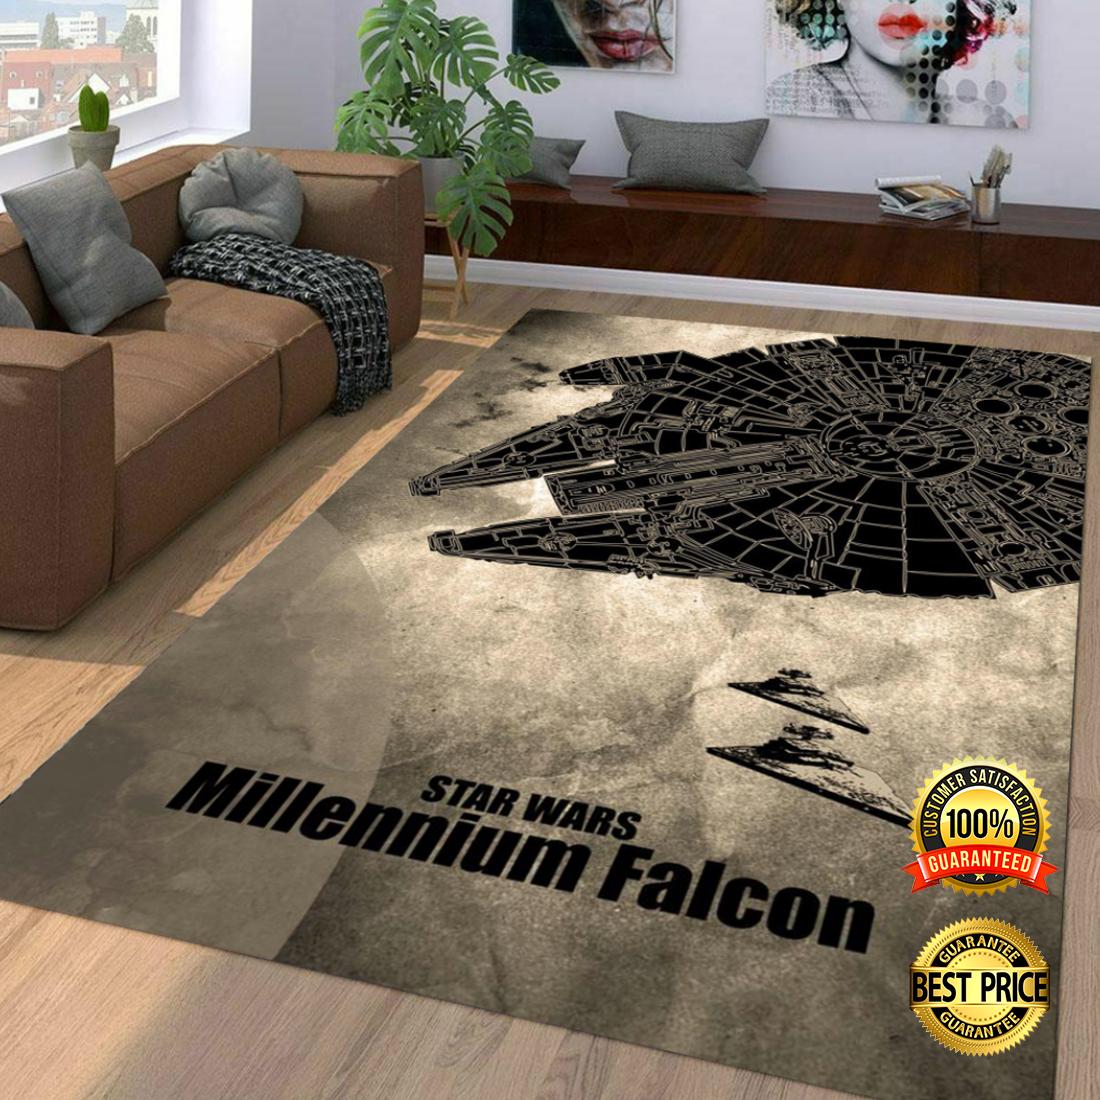 Star Wars Millennium Falcon rug 4